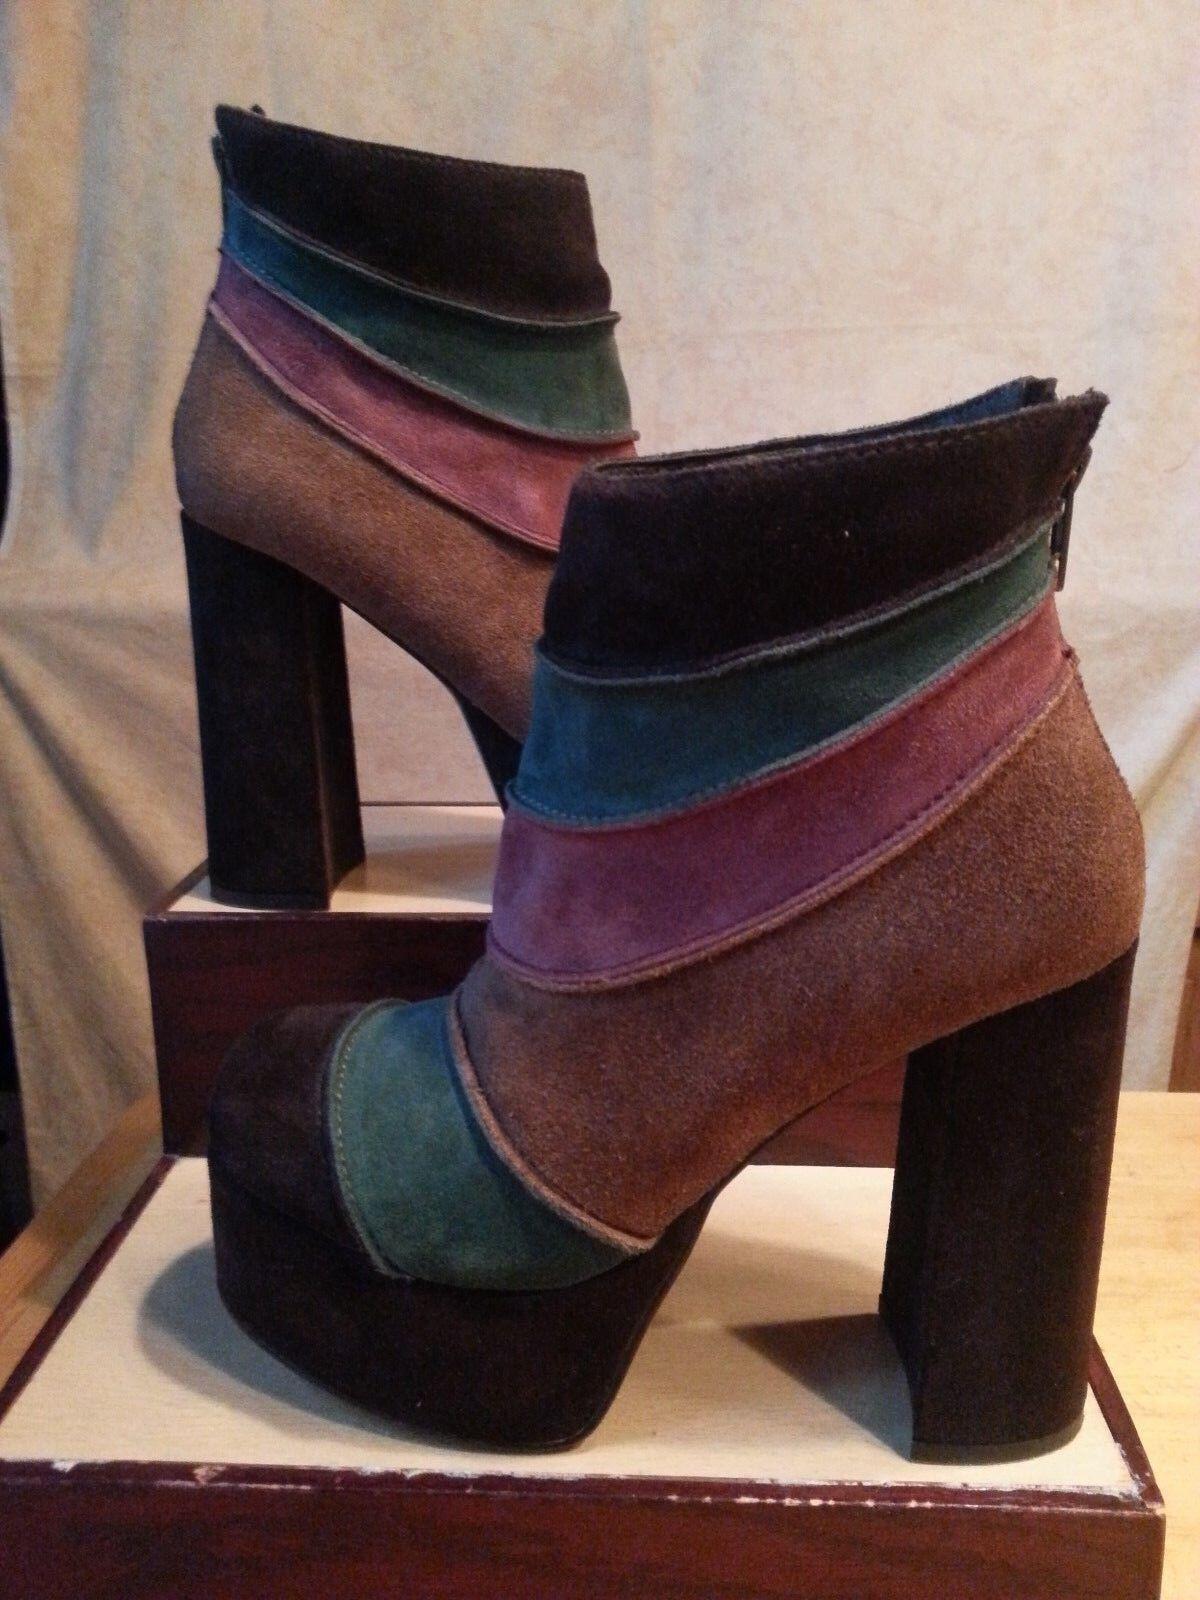 ZIGI Girl Groove Suede Leather Short Boots Multicolored High Heel Plotform FAB 7